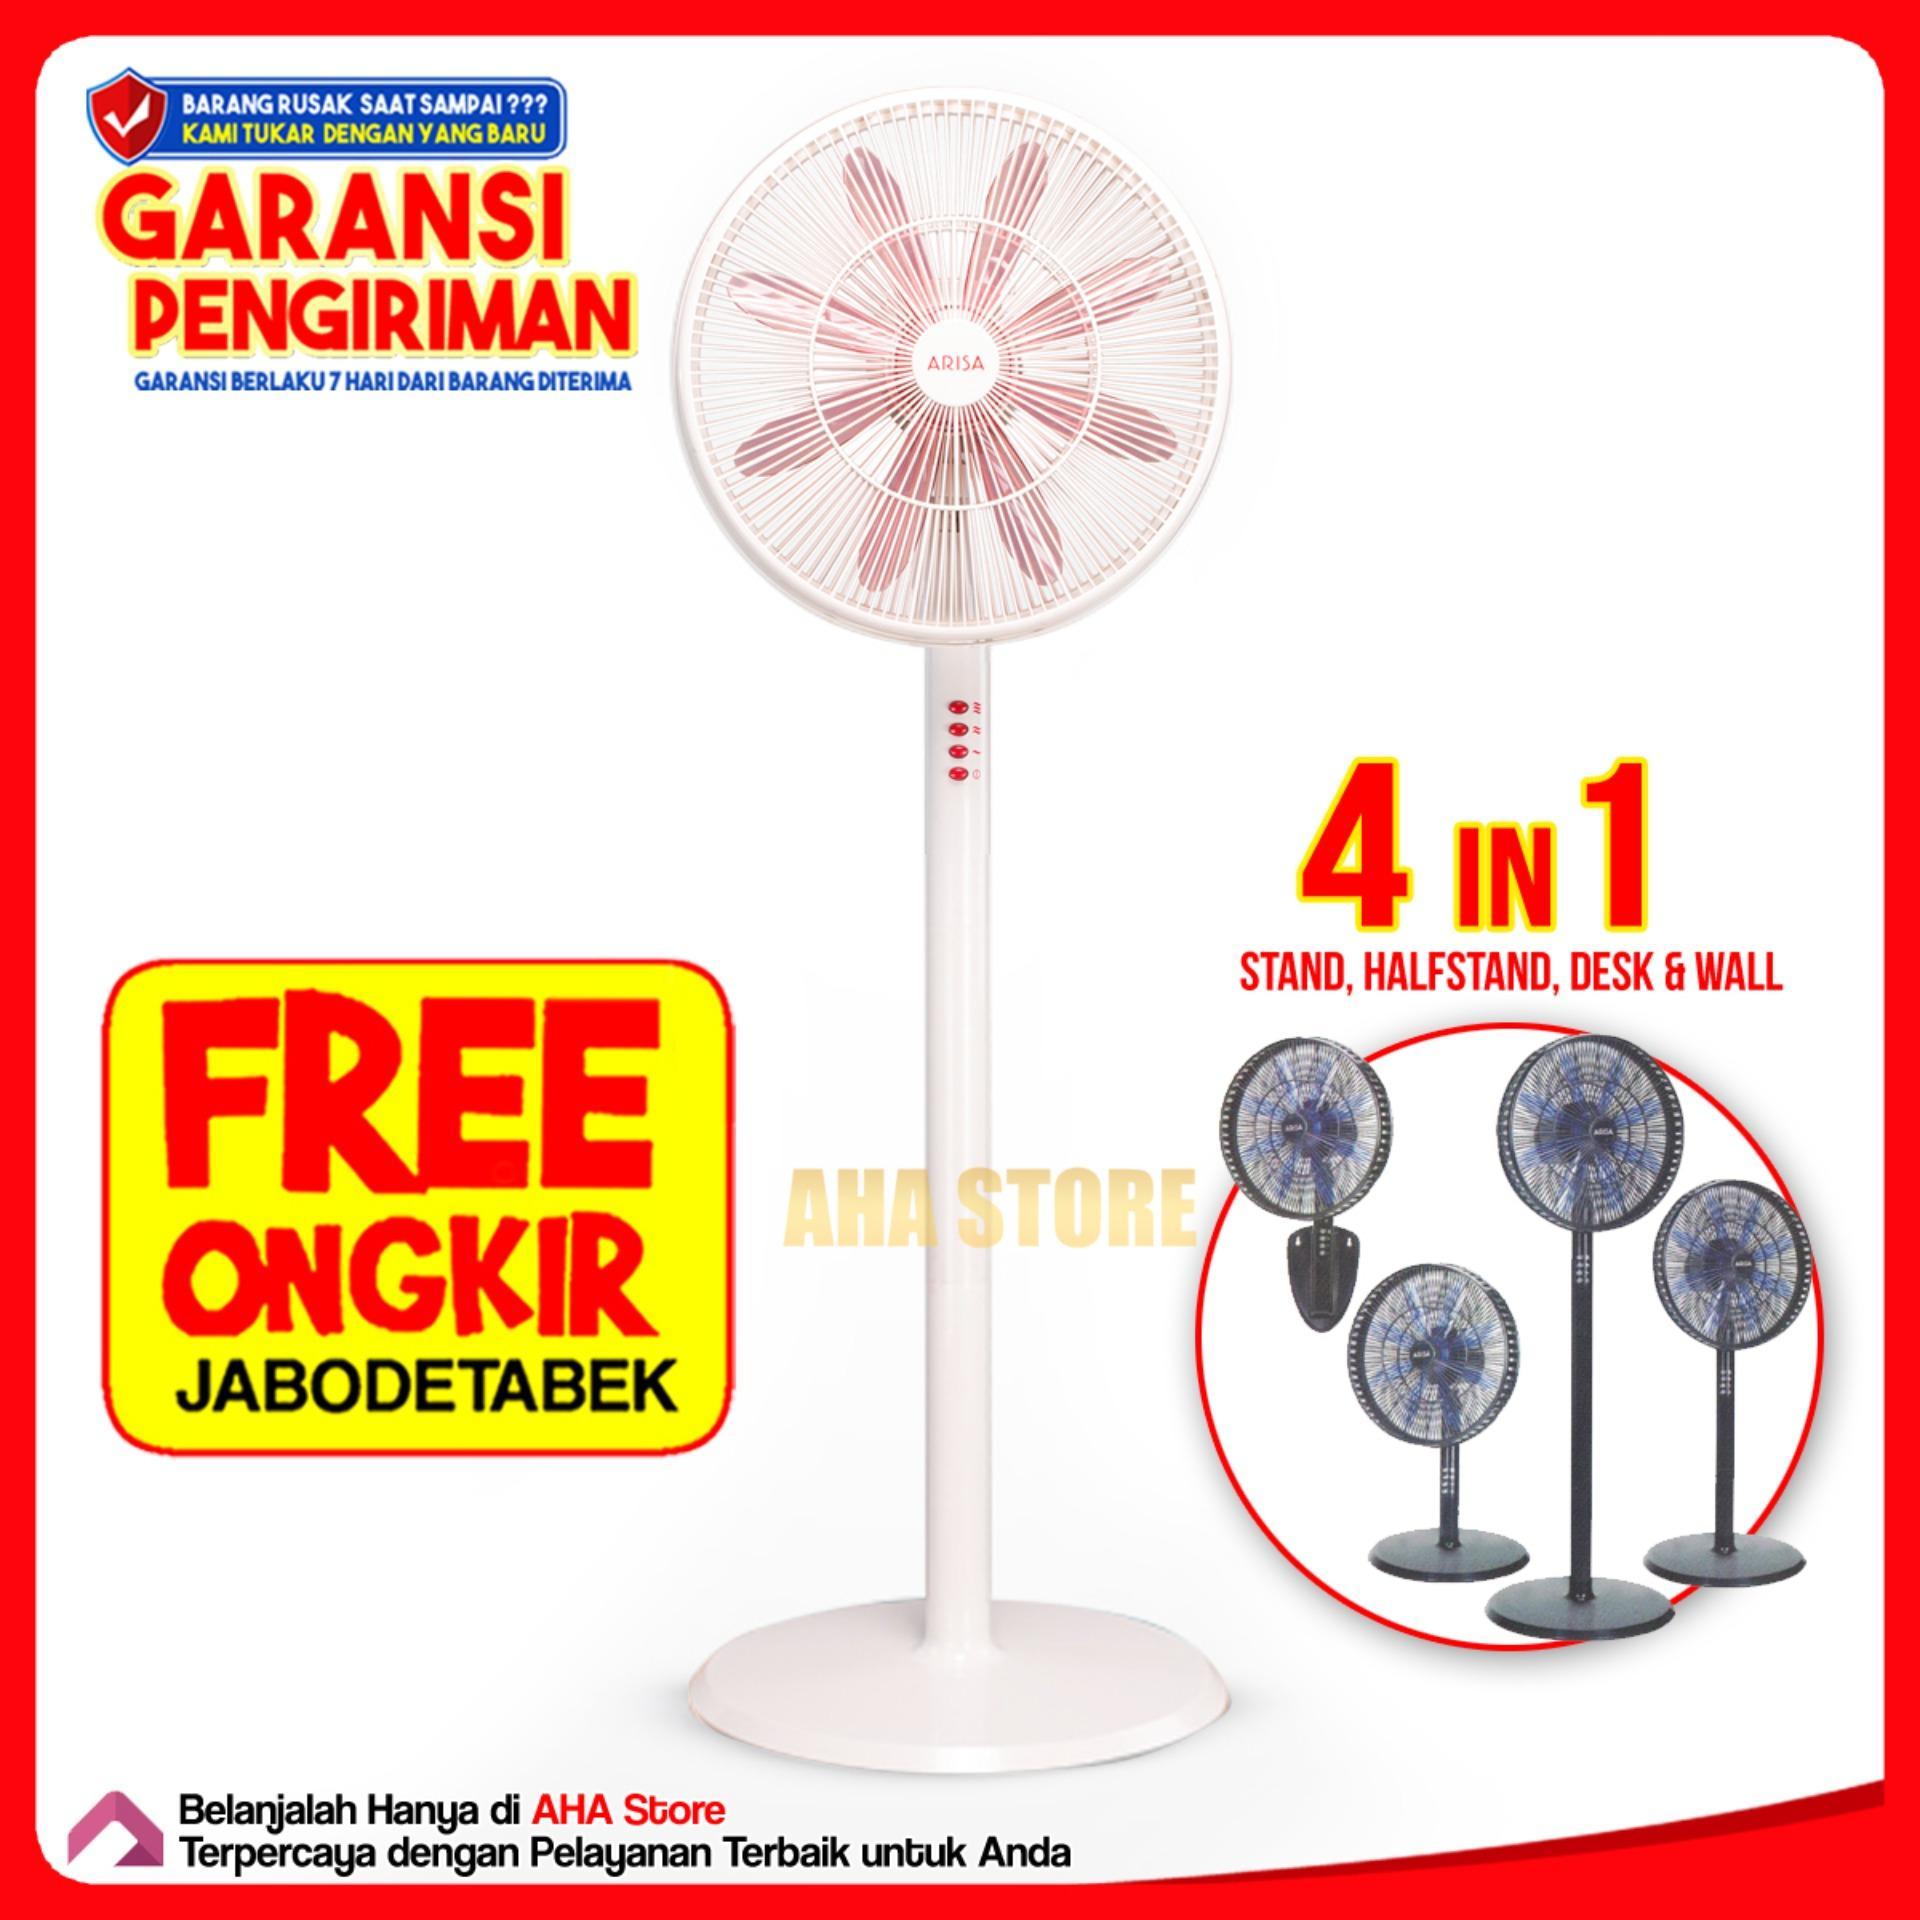 Features Arisa Kipas Angin 4 In 1 Fa 1601 Free Ongkir Jabodetabek Starco If 318 18 Inch